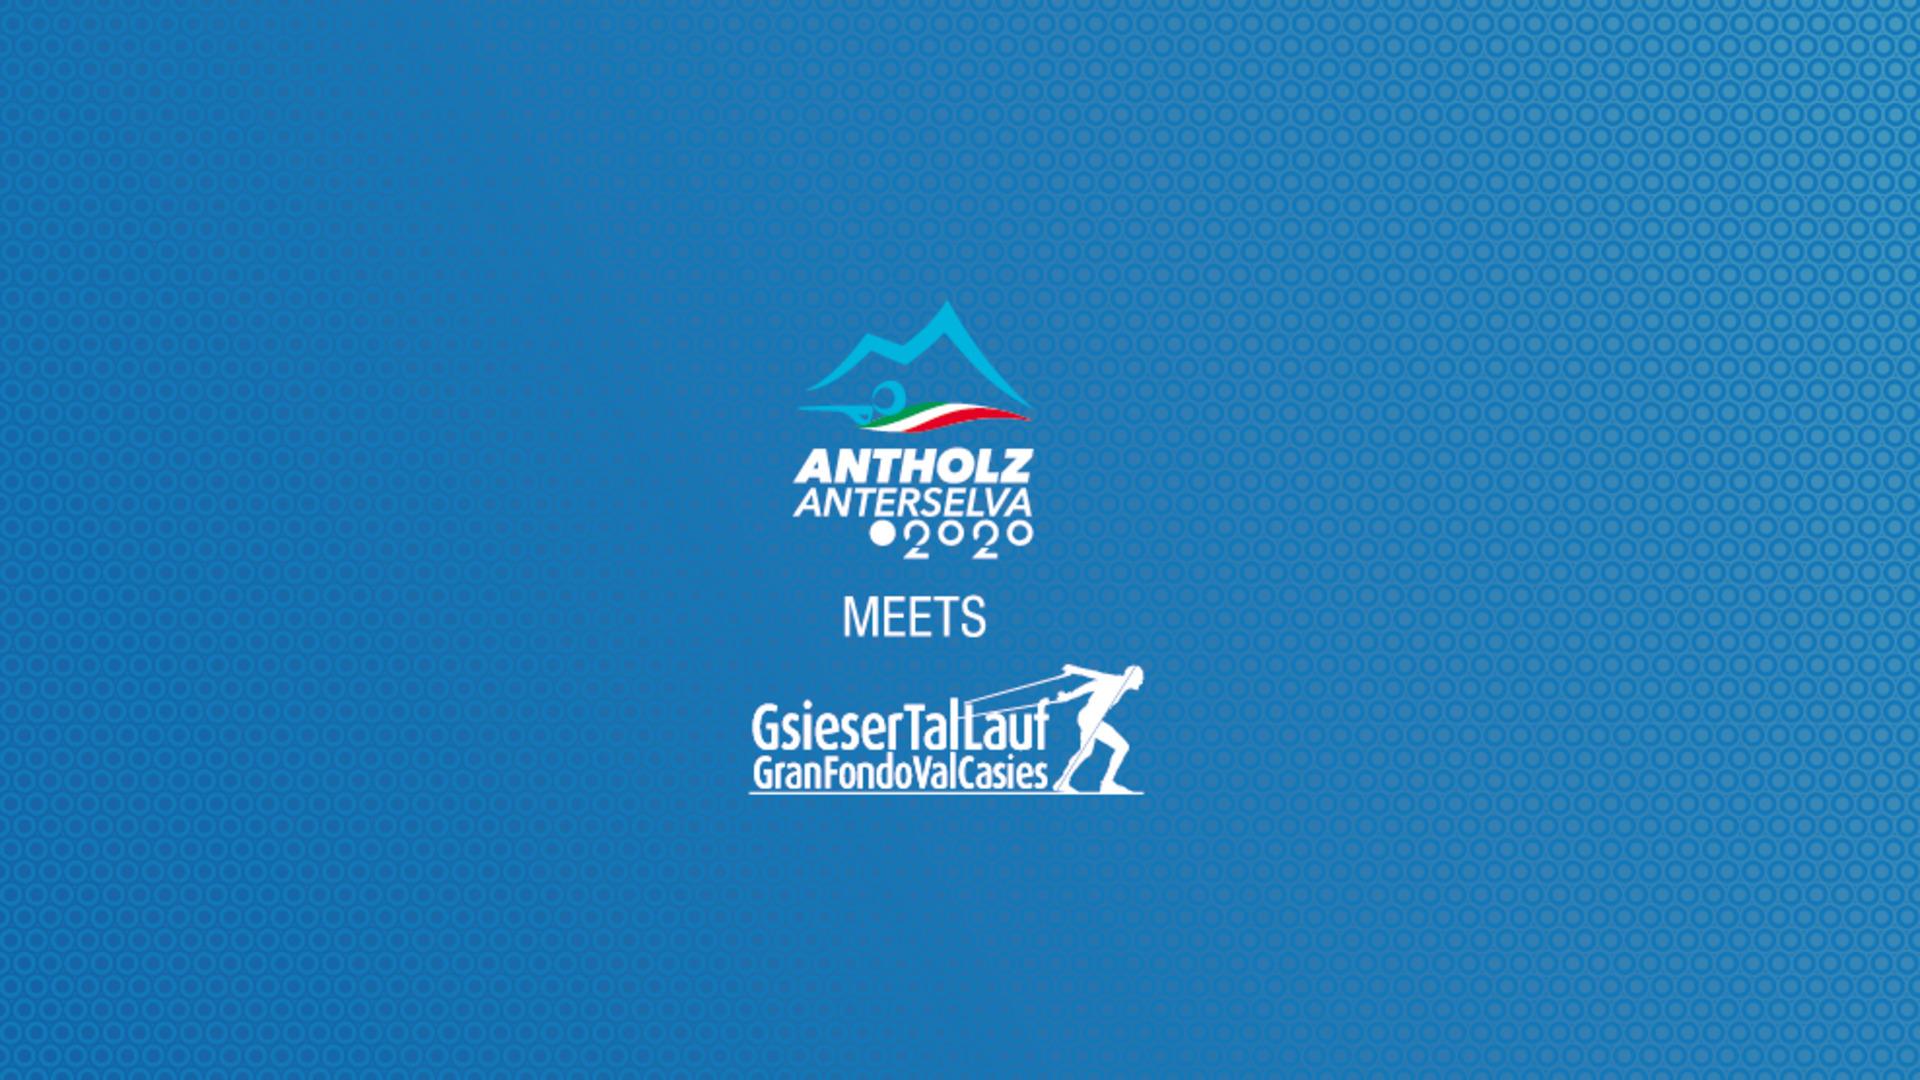 07.06.2019 - BIATHLON ANTHOLZ 2020 meets GRAN FONDO VAL CASIES